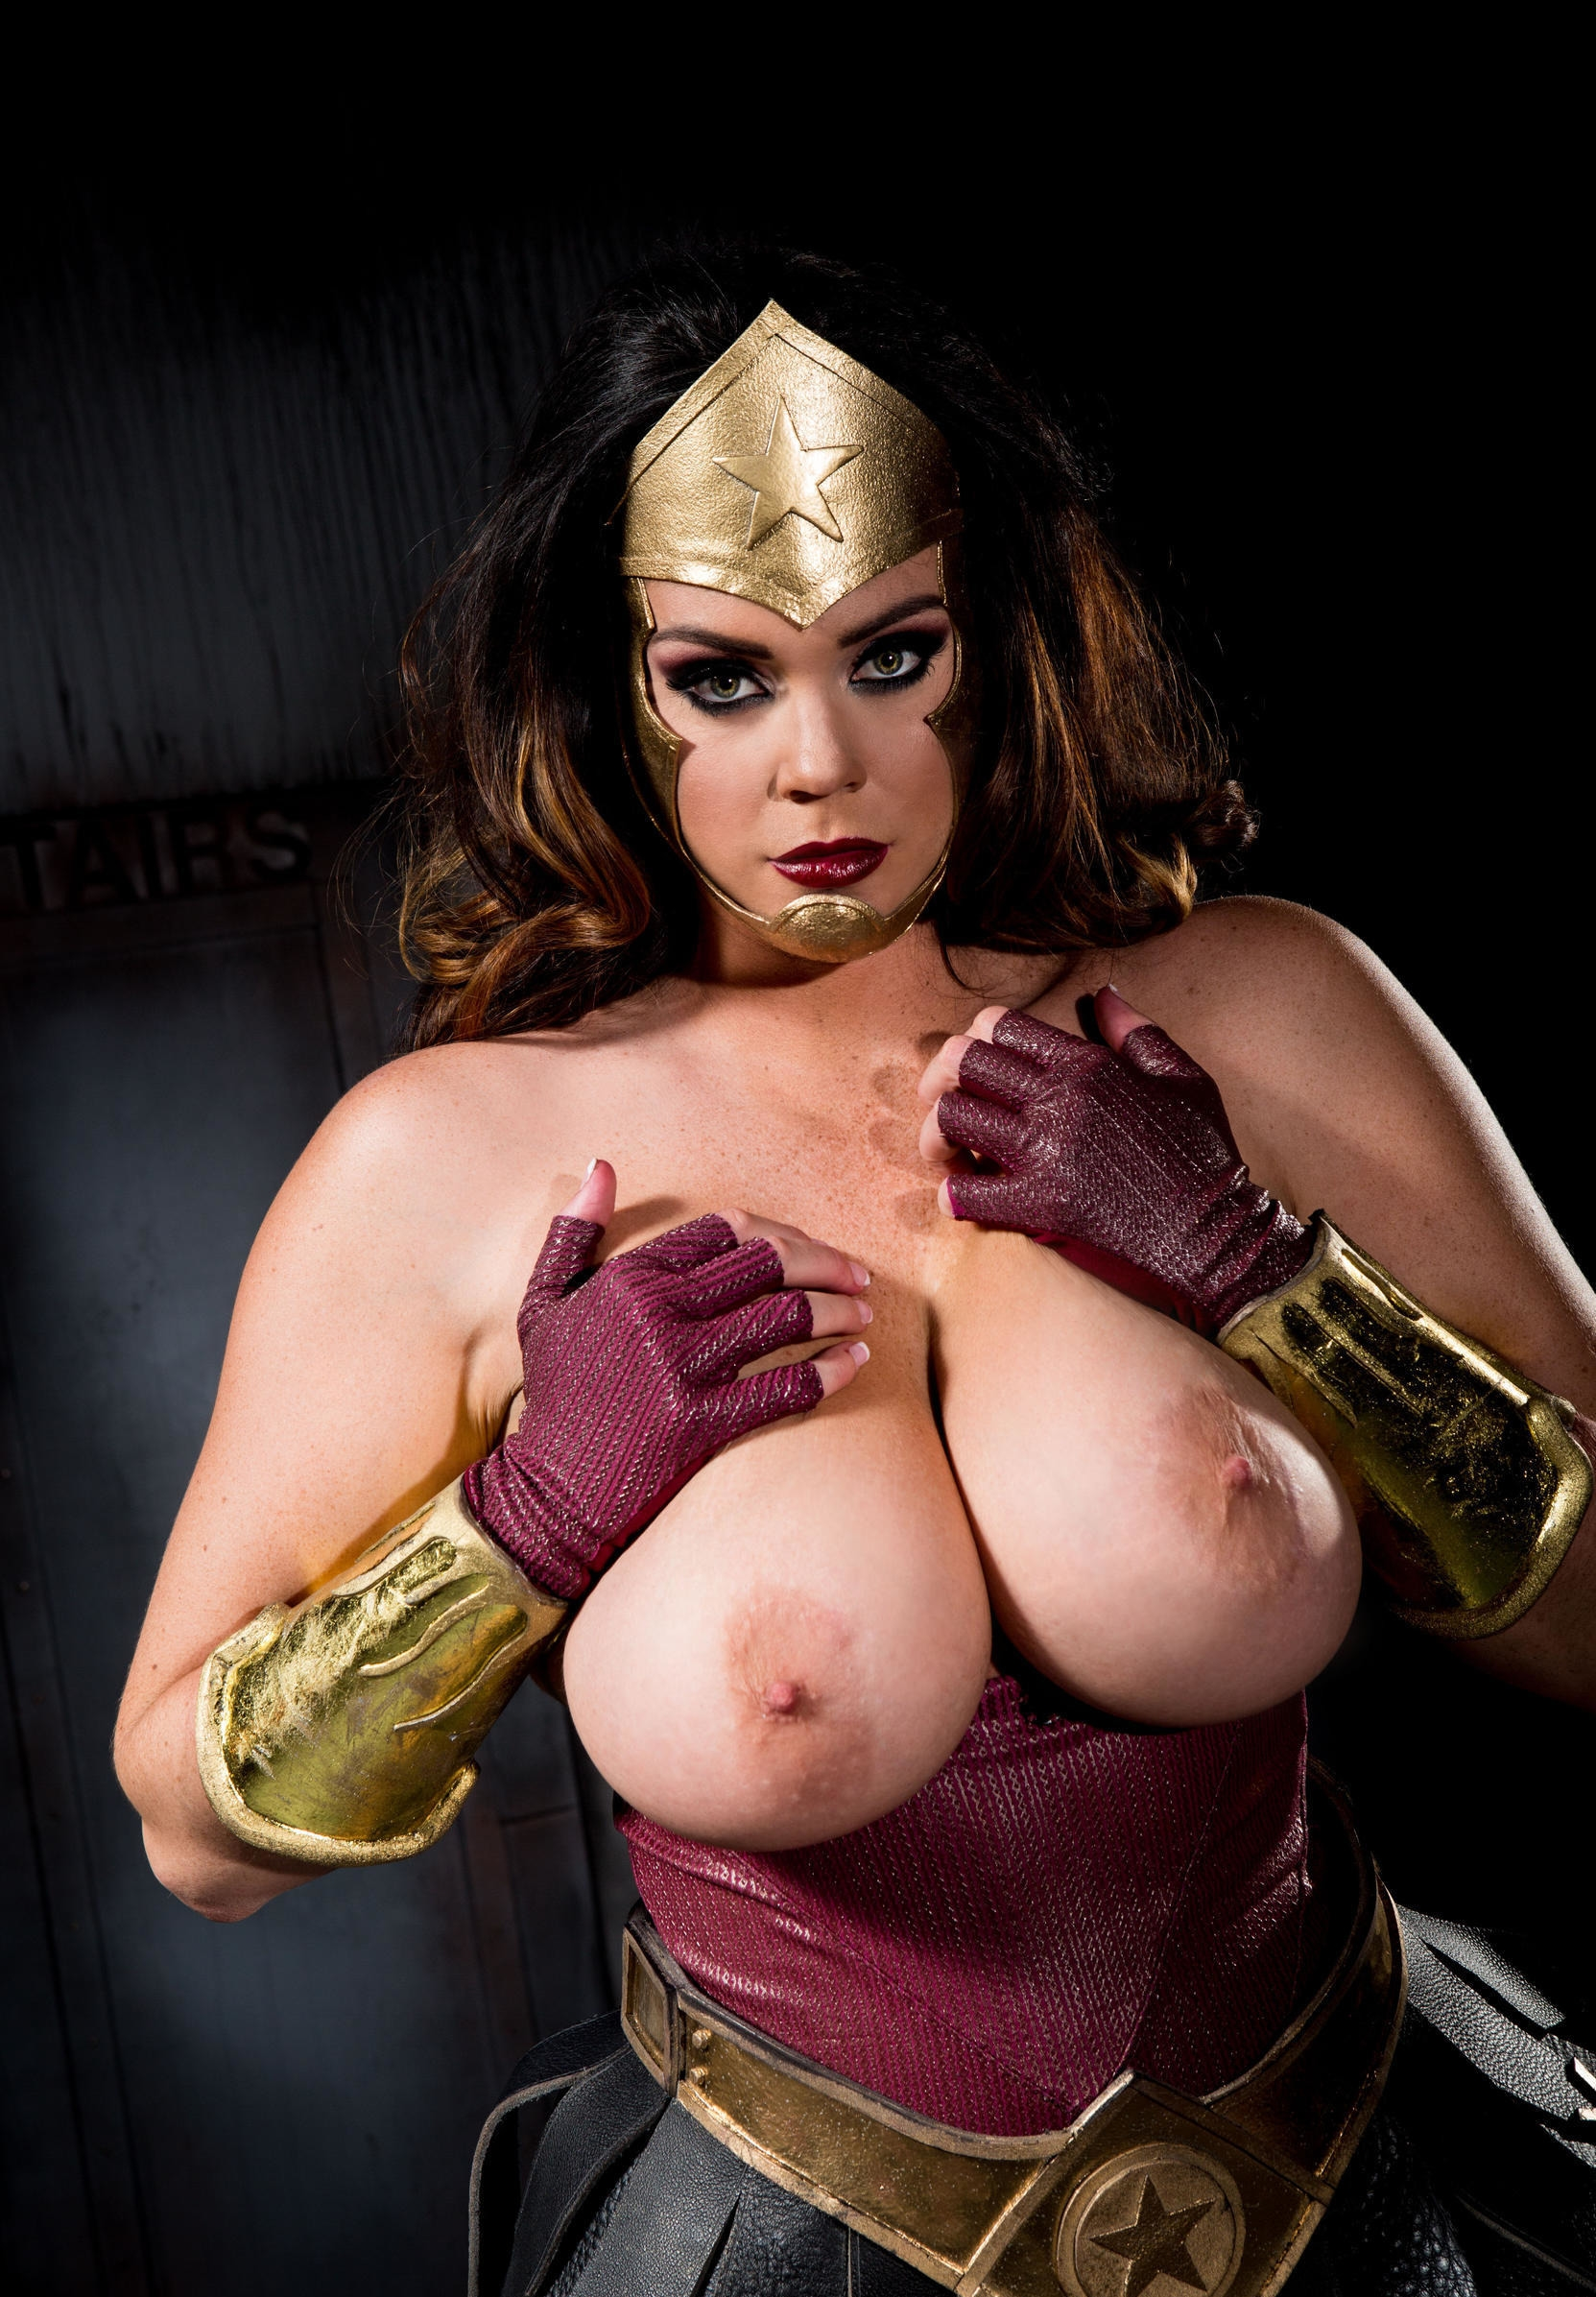 tits-costumed-women-nude-twins-nude-sex